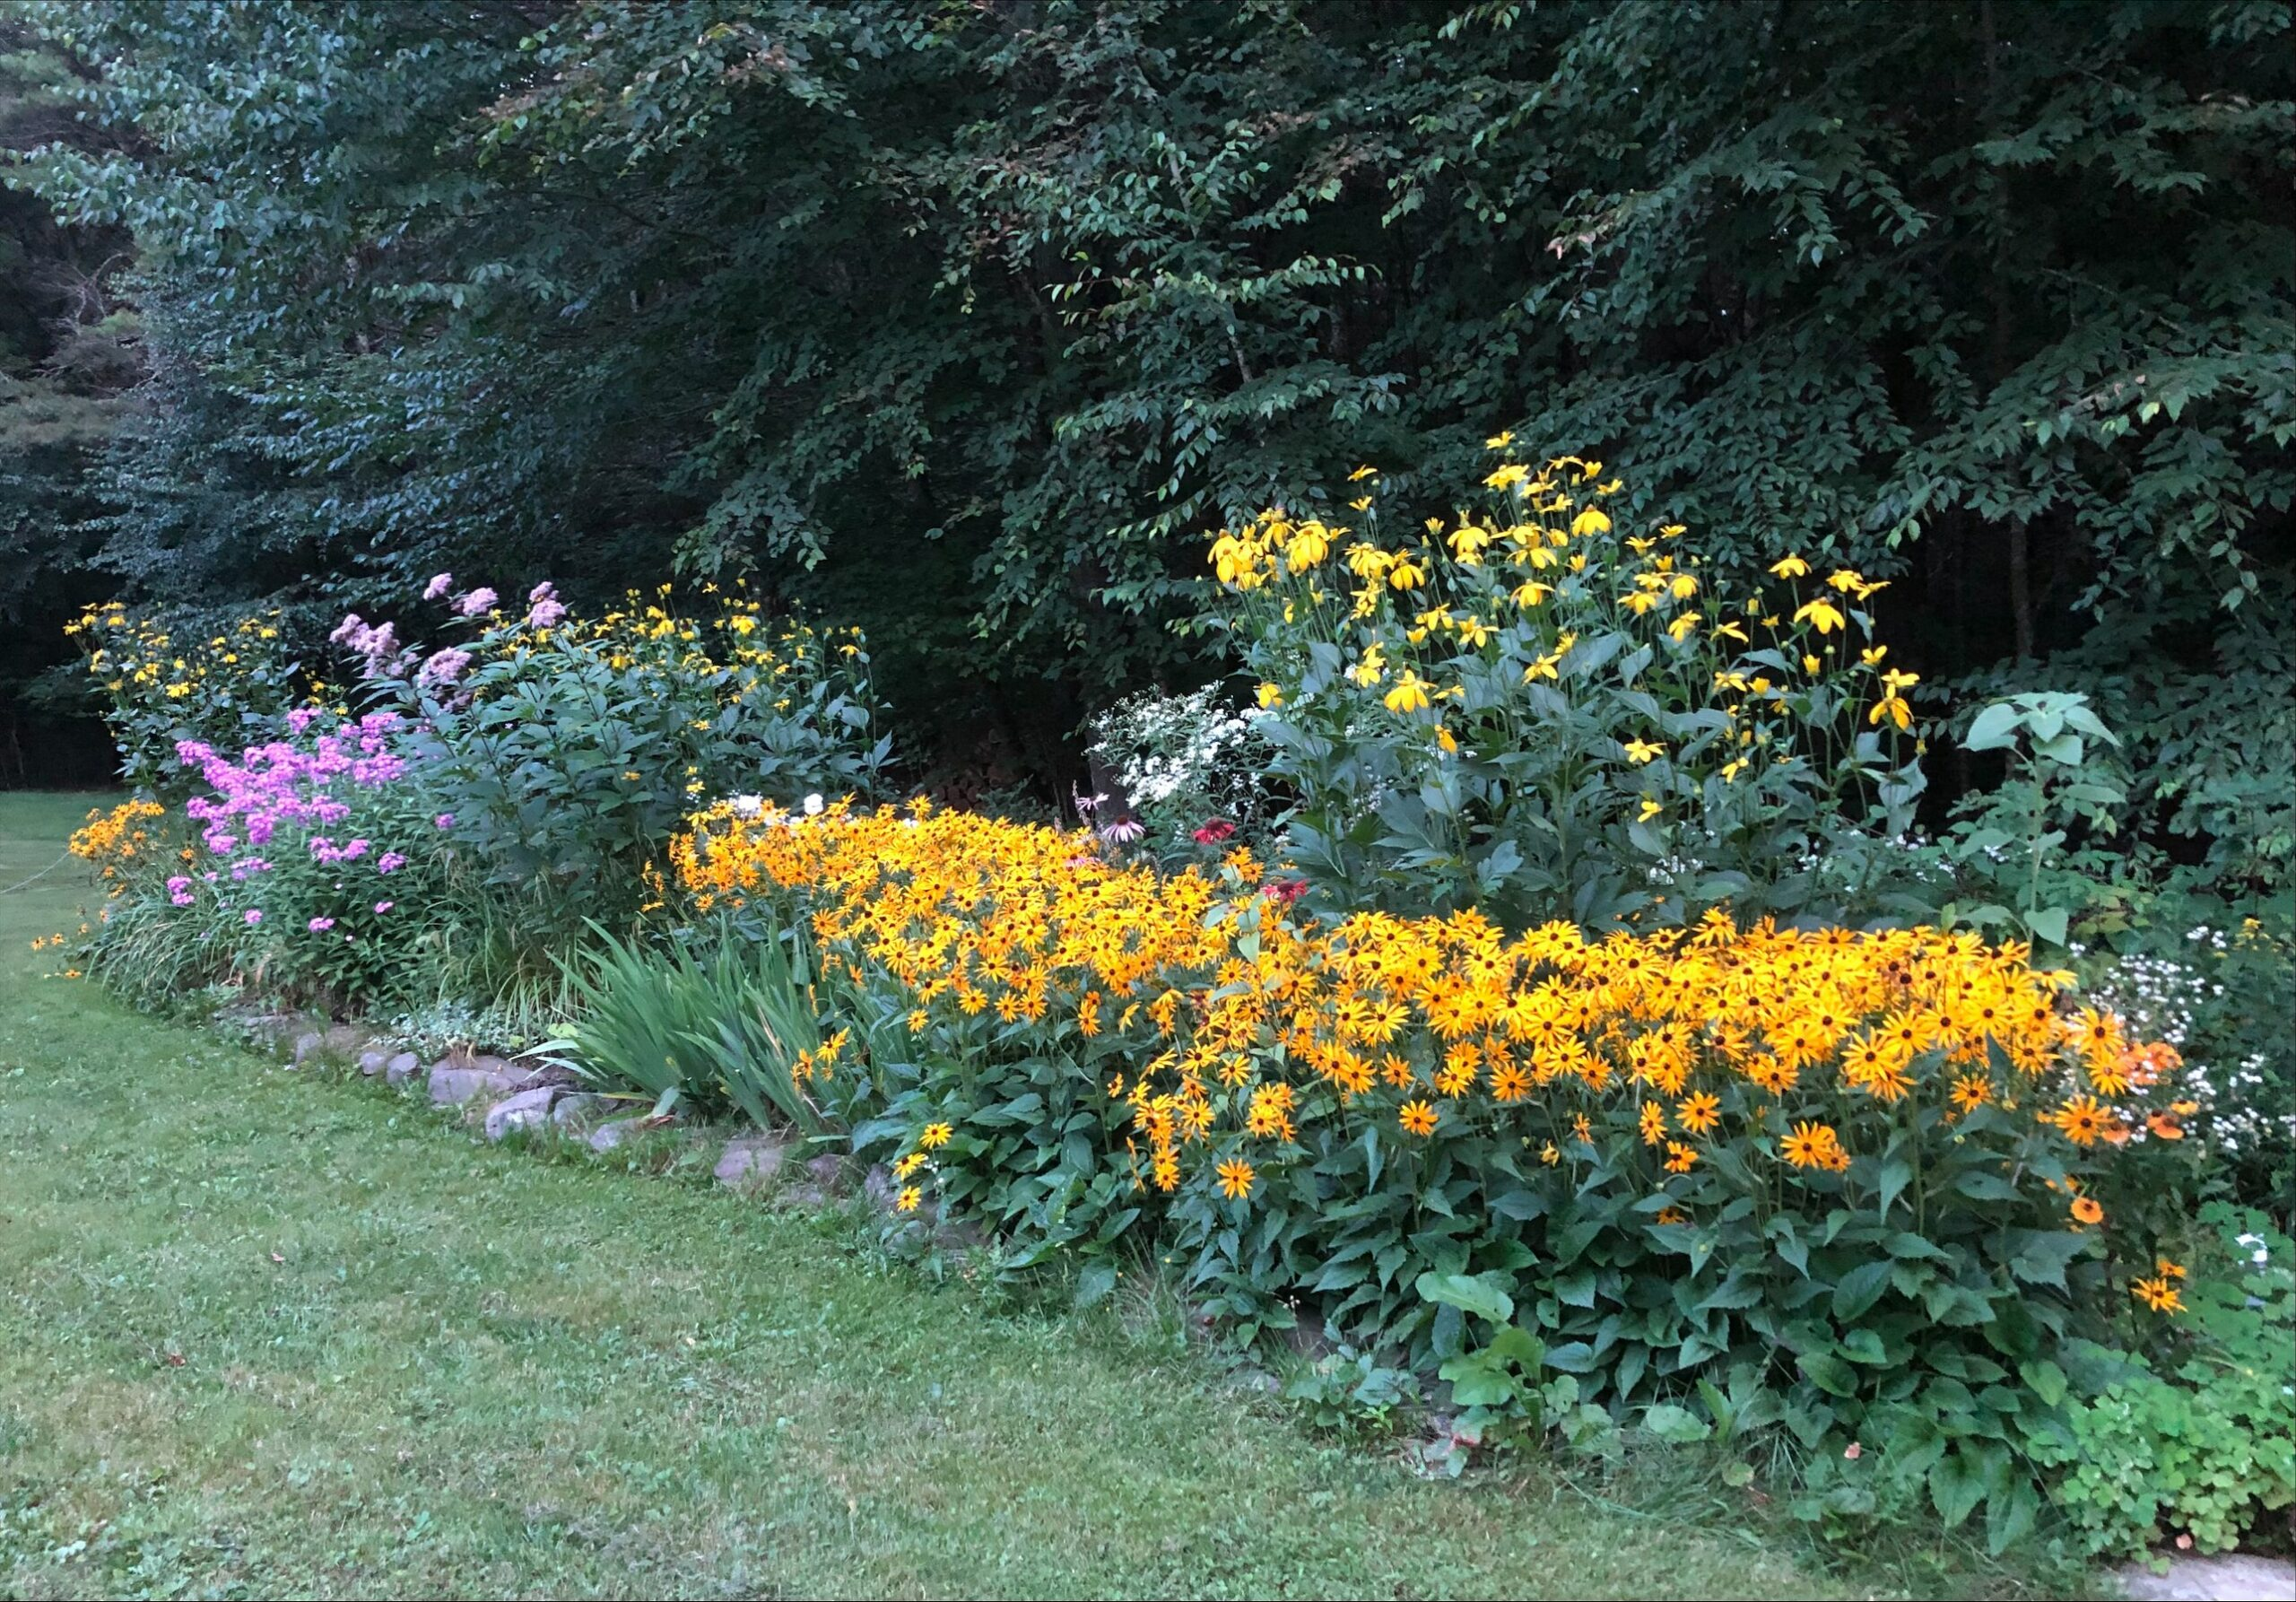 garden full of yellow flowers